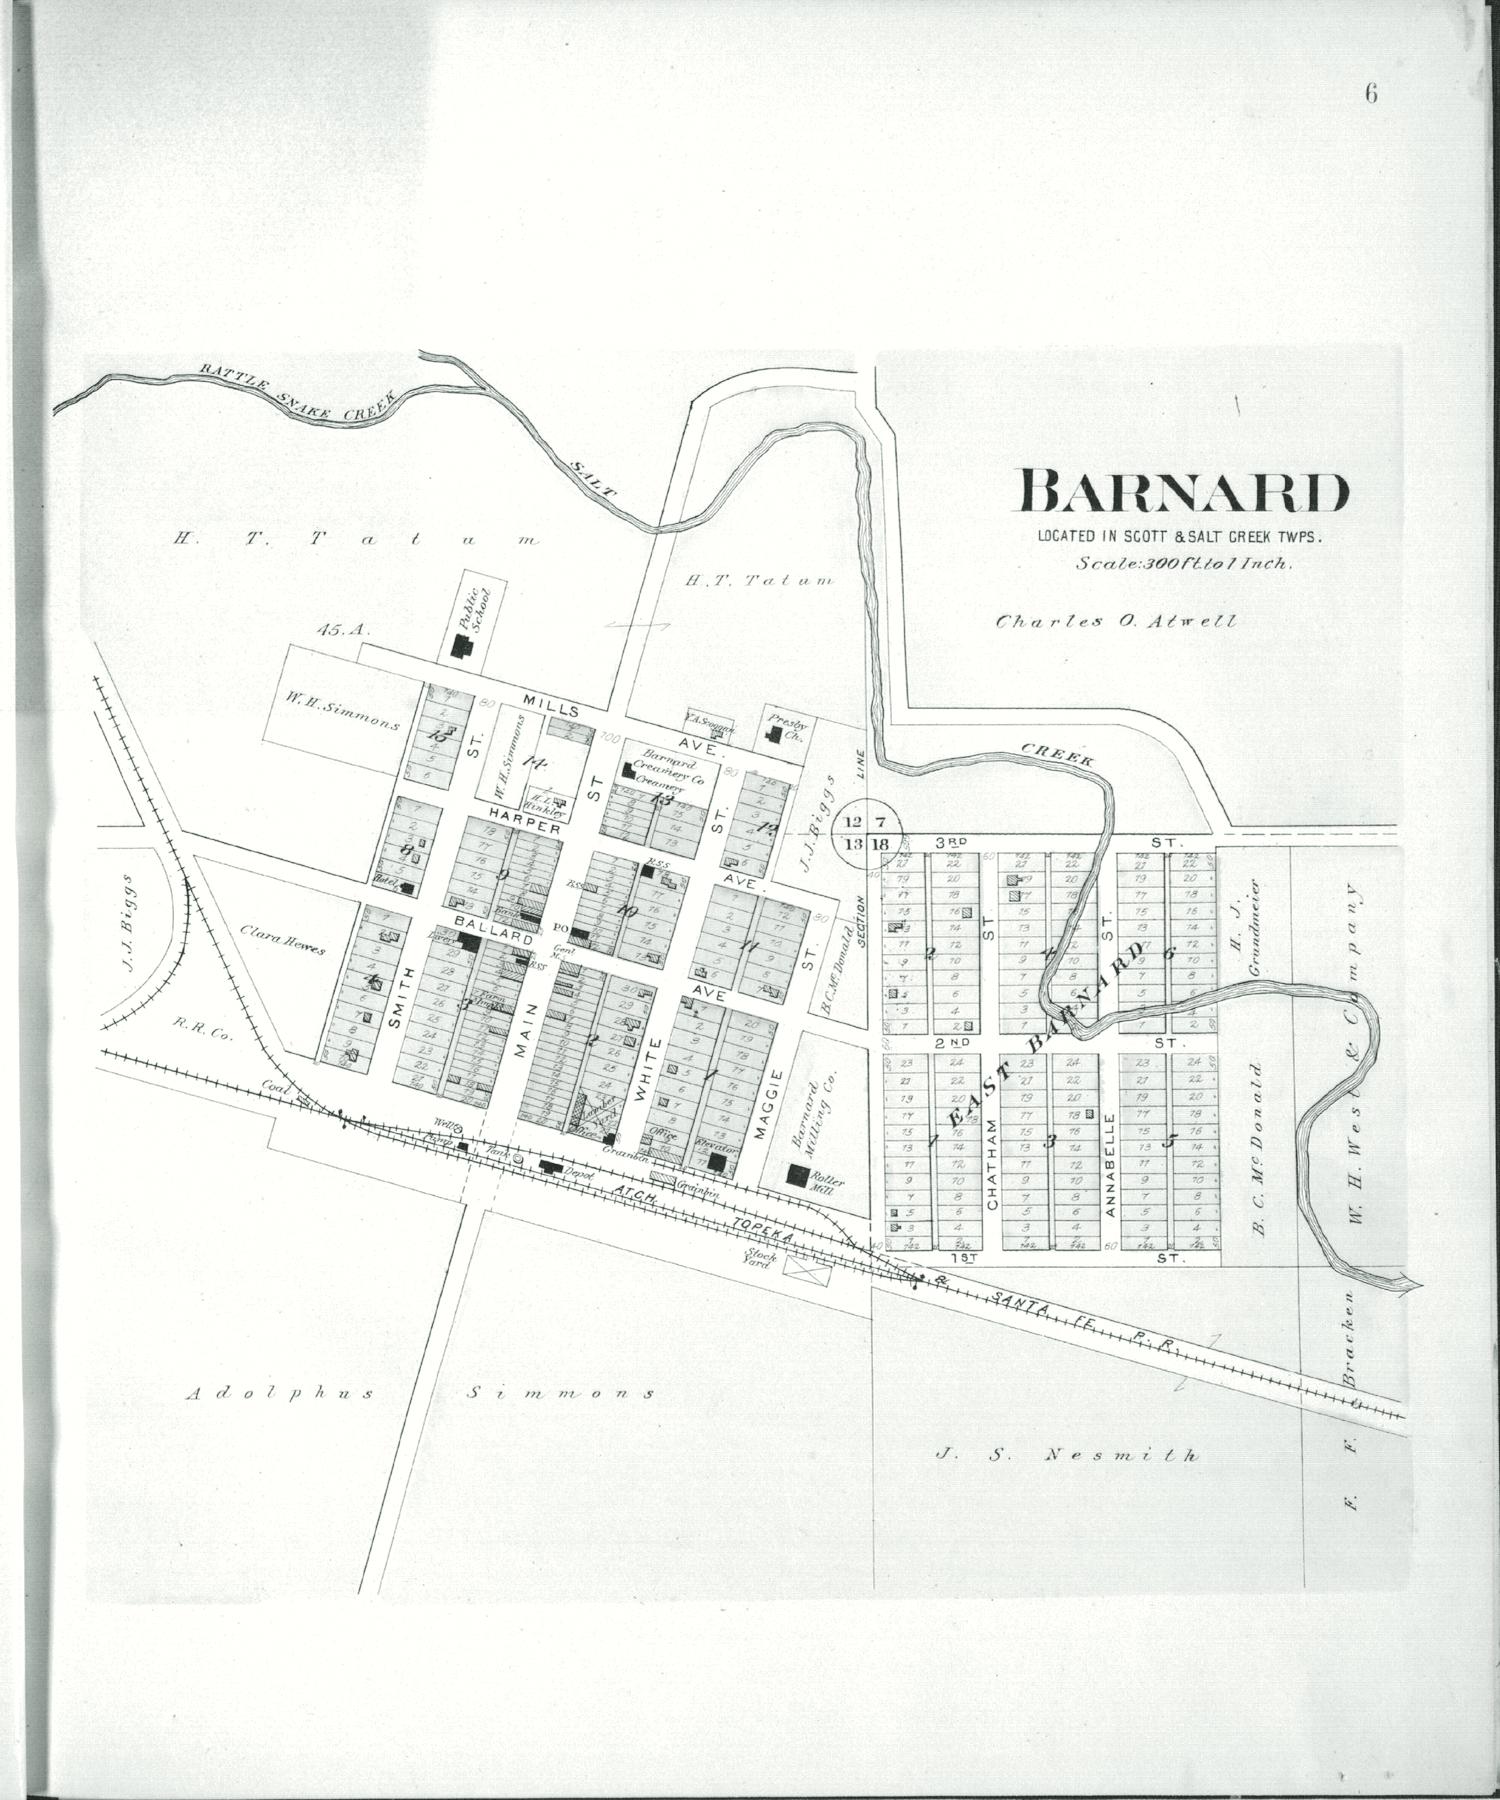 Plat book of Lincoln County, Kansas - 6